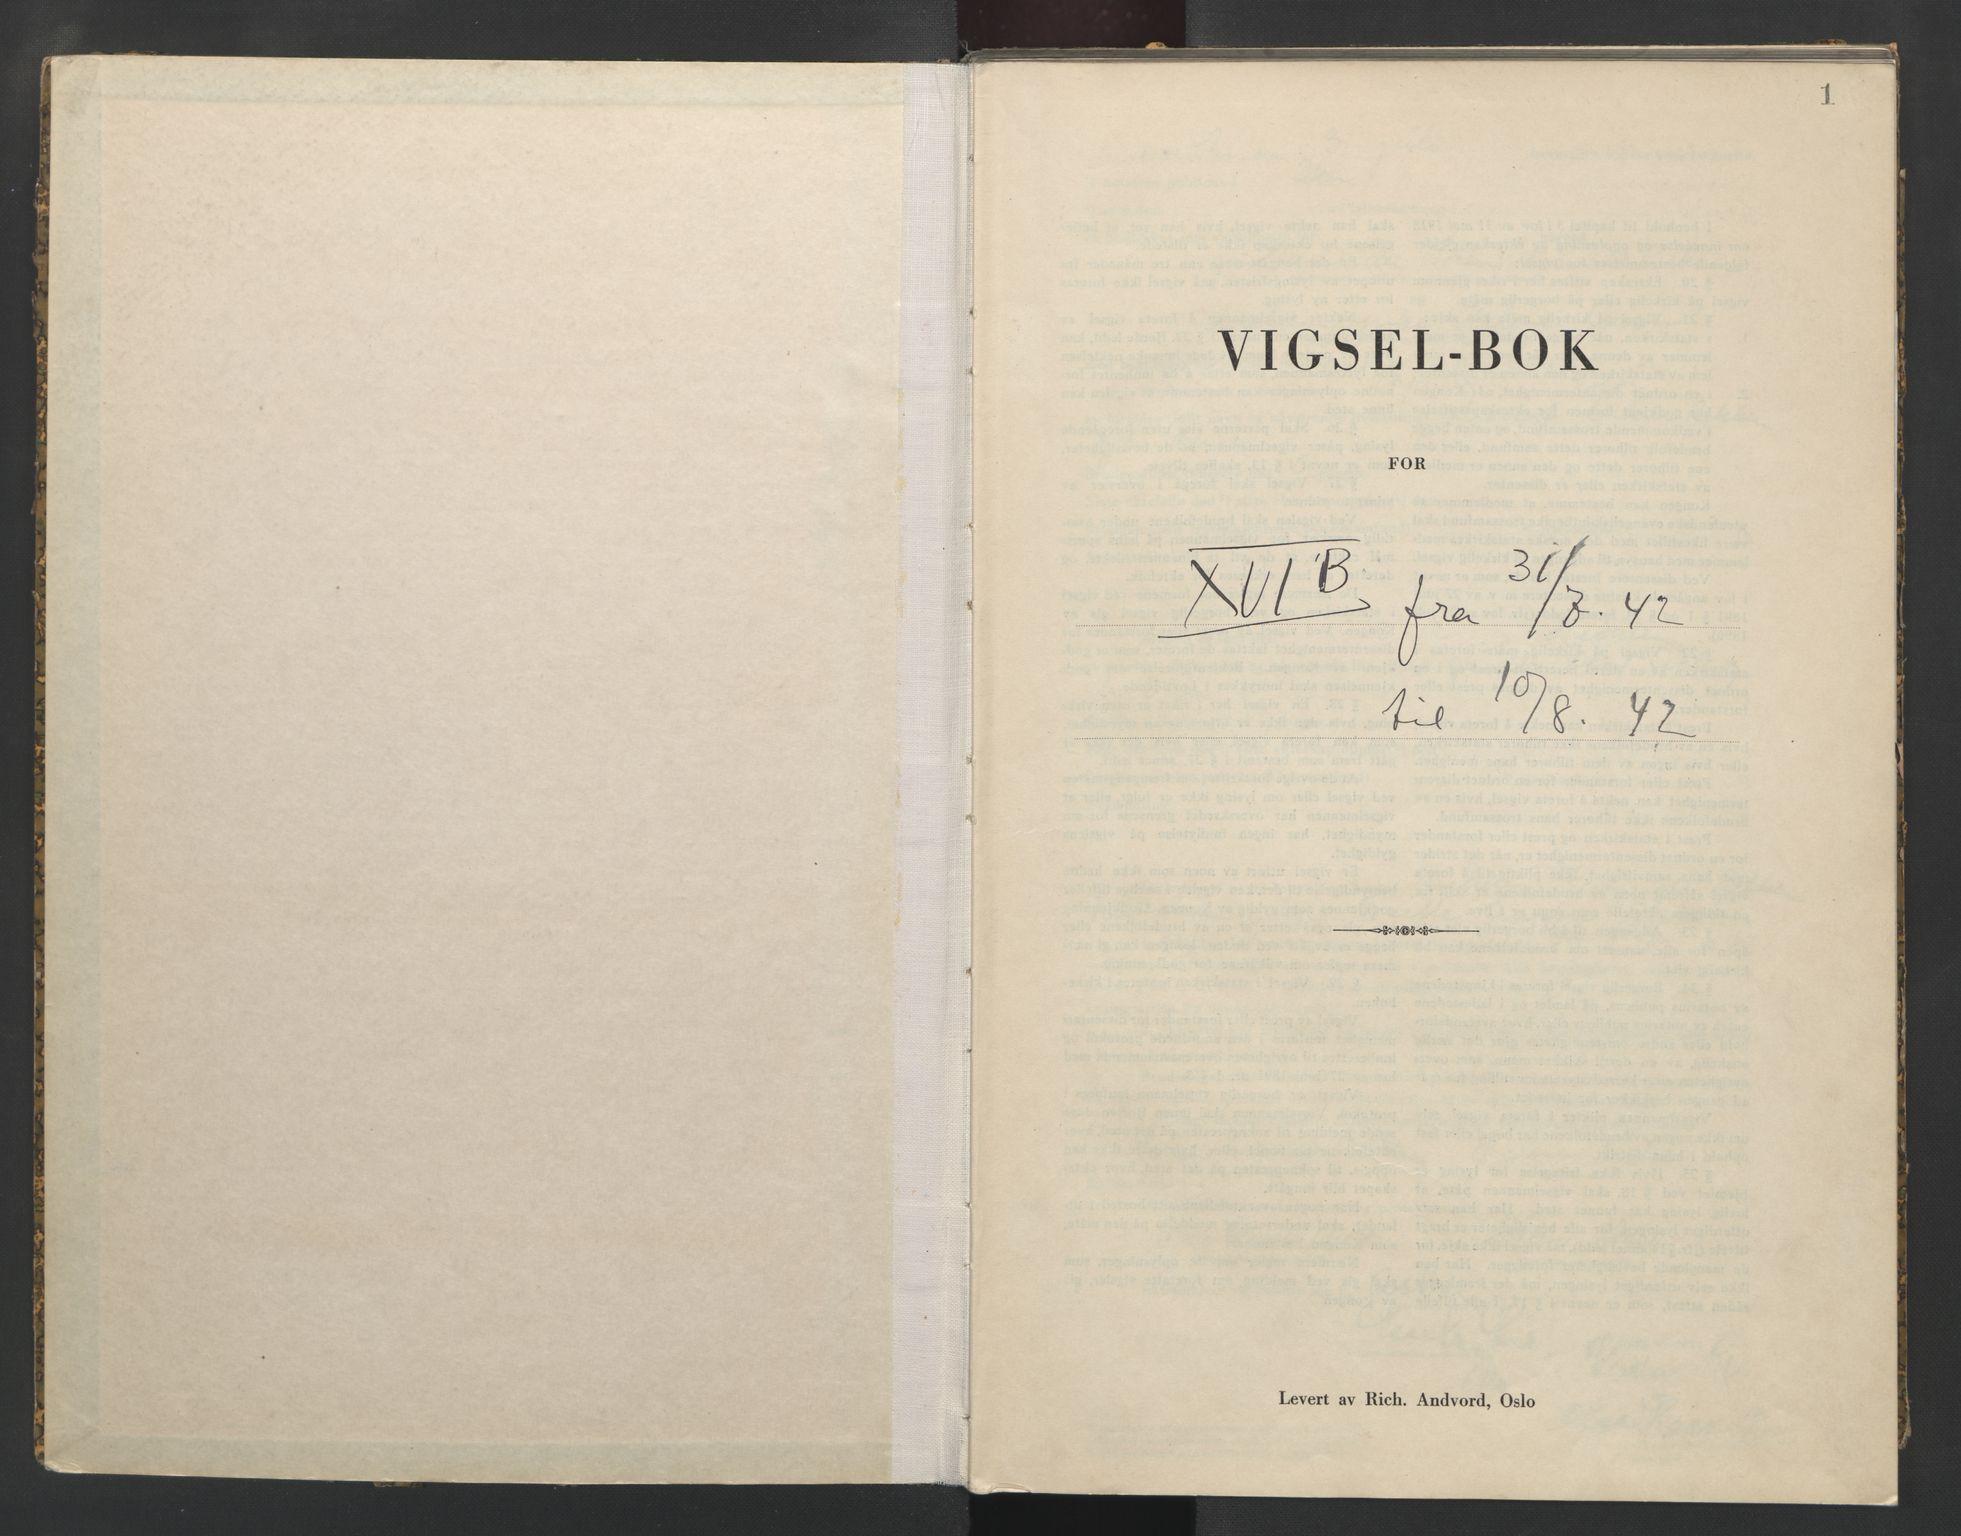 SAO, Aker sorenskriveri, L/Lc/Lcb/L0017: Vigselprotokoll, 1942, s. 1